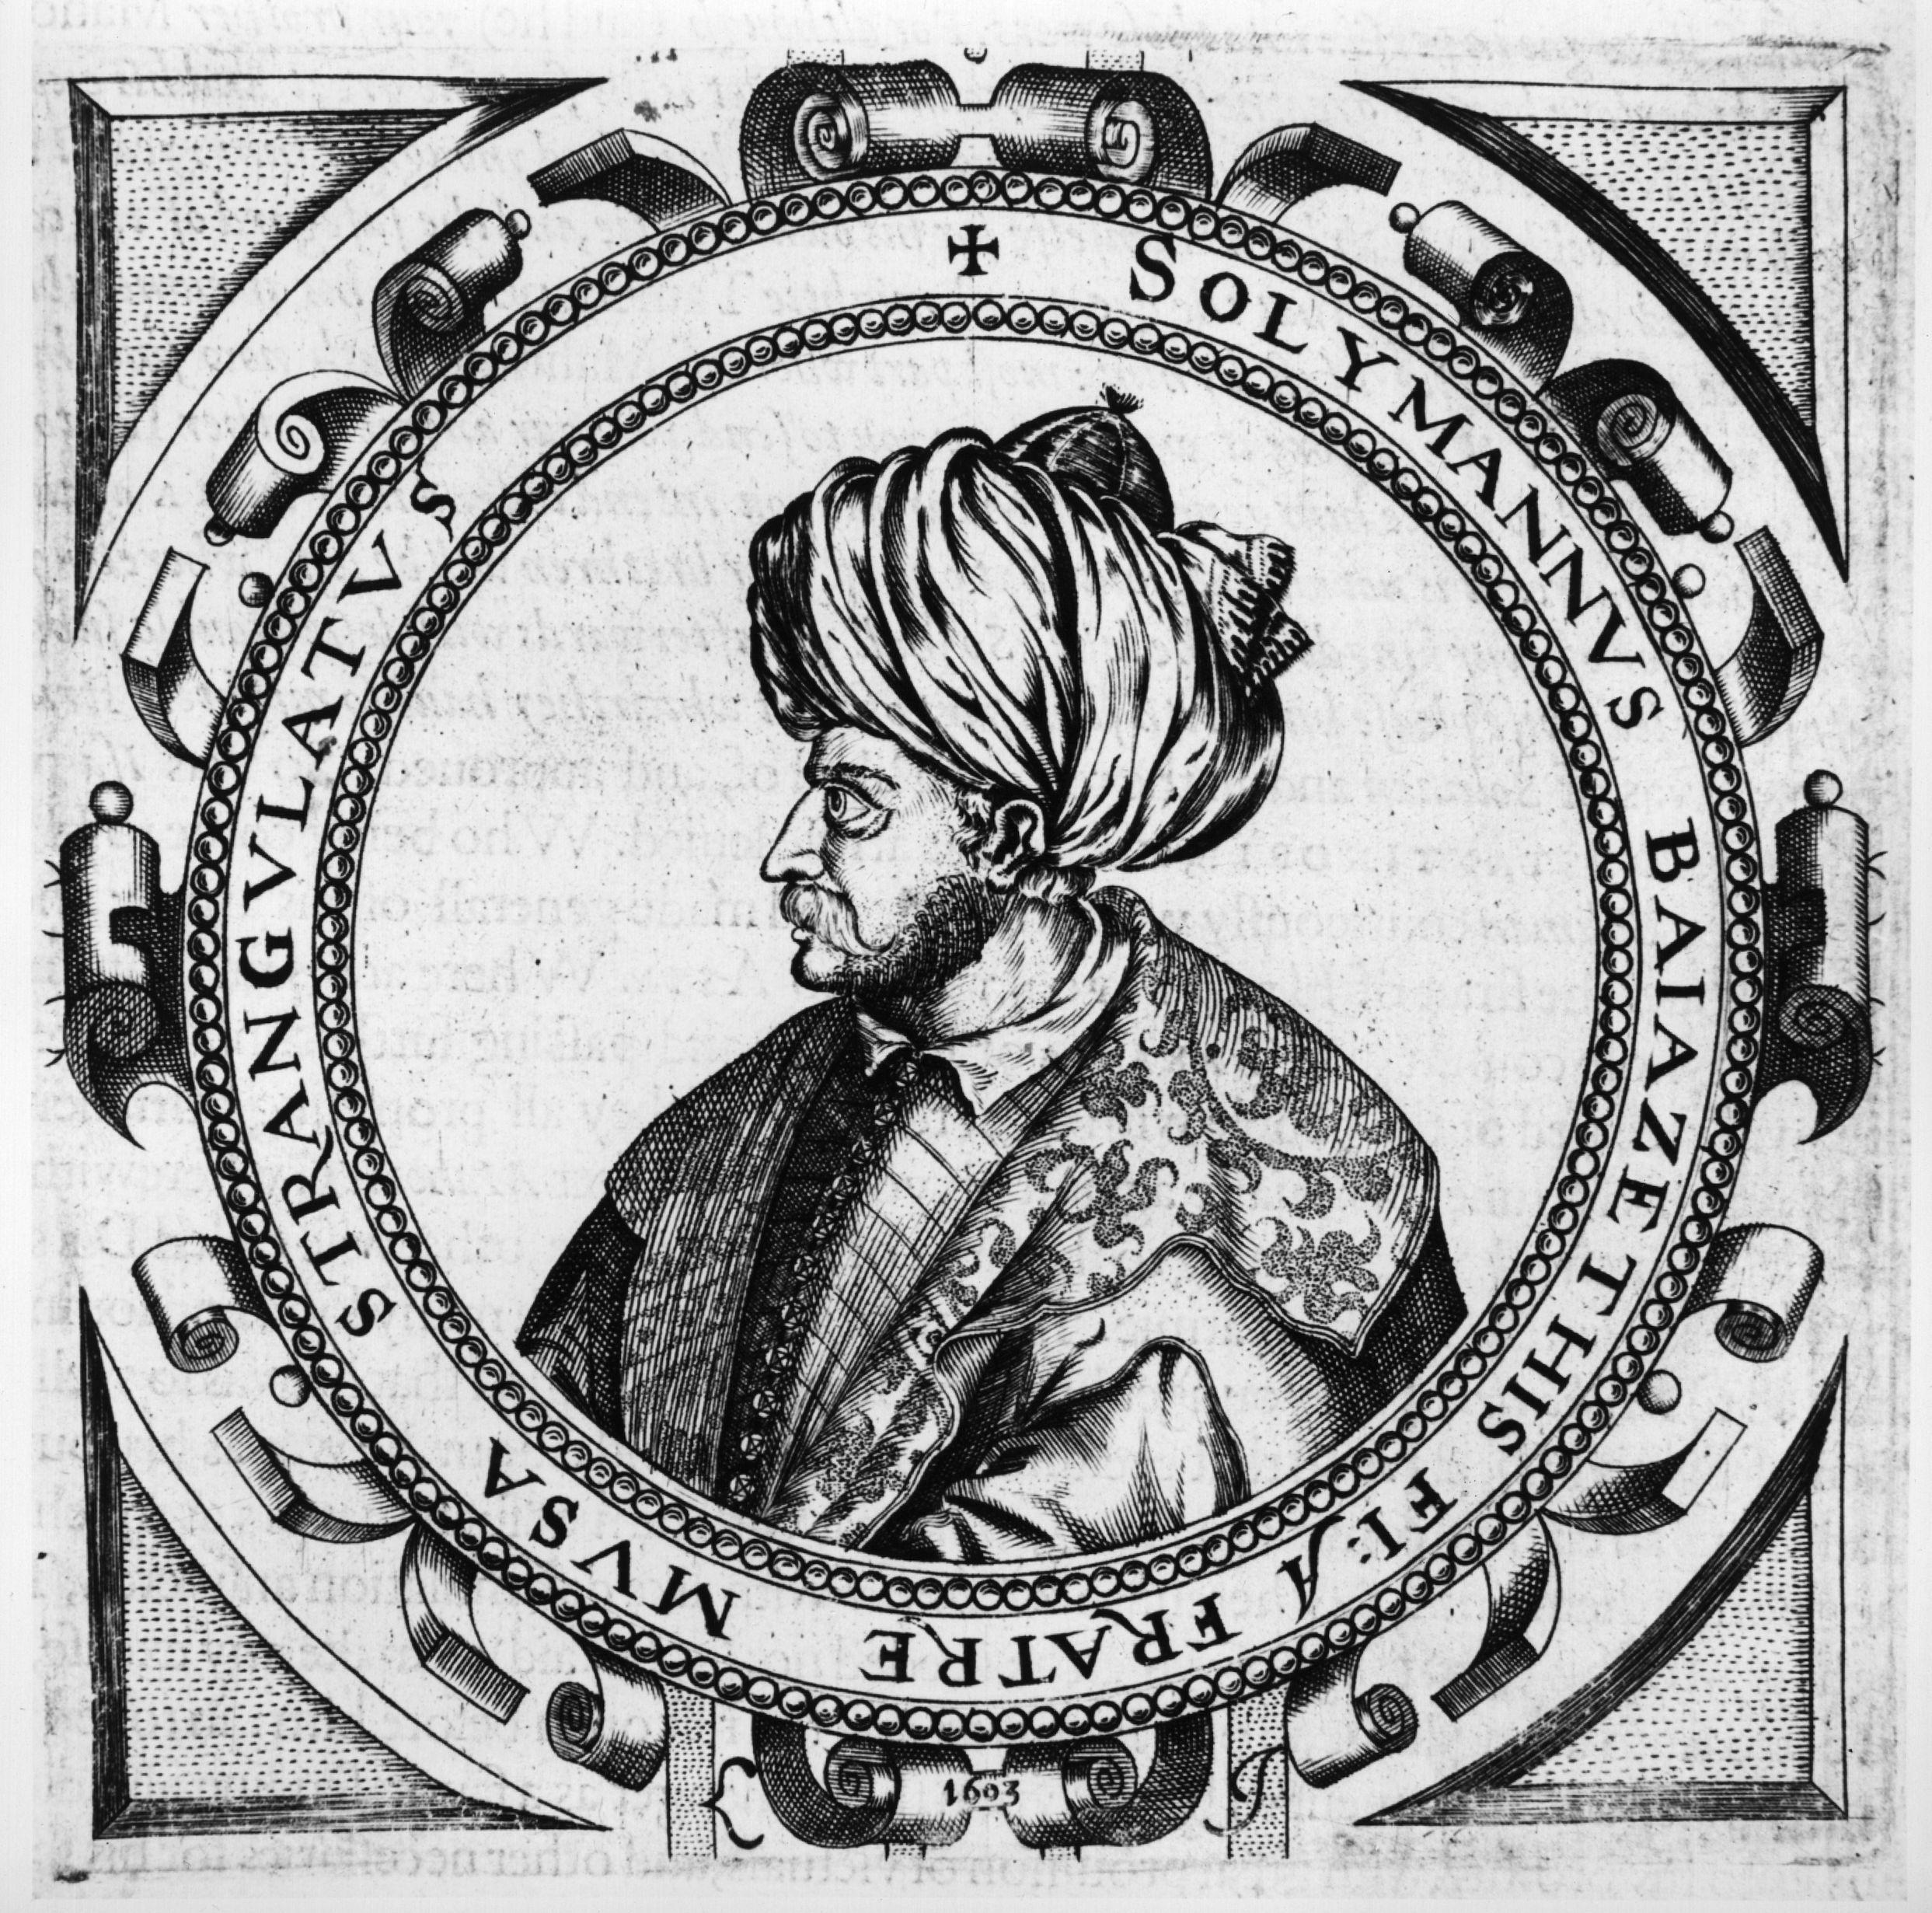 Caliph Soliman